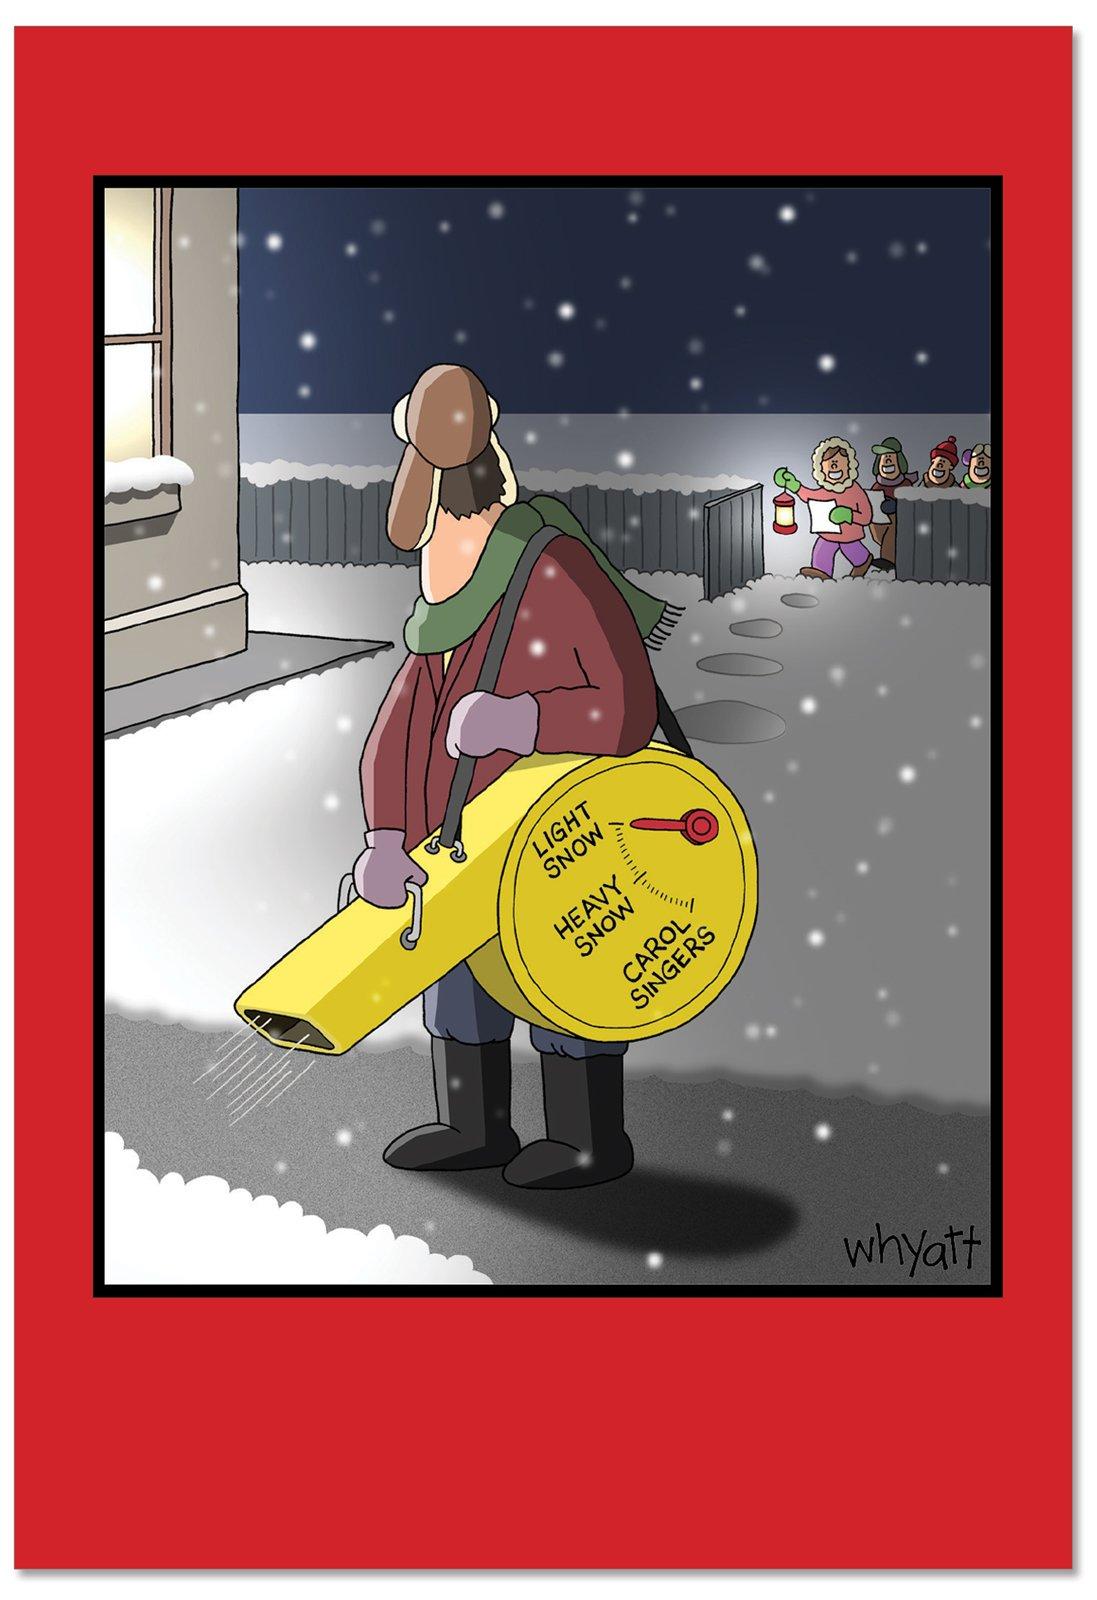 12 'Snow Blower Settings' Boxed Christmas Cards w/Envelopes 4.63 x 6.75 inch), Humorous Christmas Caroler Holiday Cards, Funny Christmas Cartoon Holiday Notes, Unique Christmas Stationery B2493XSG